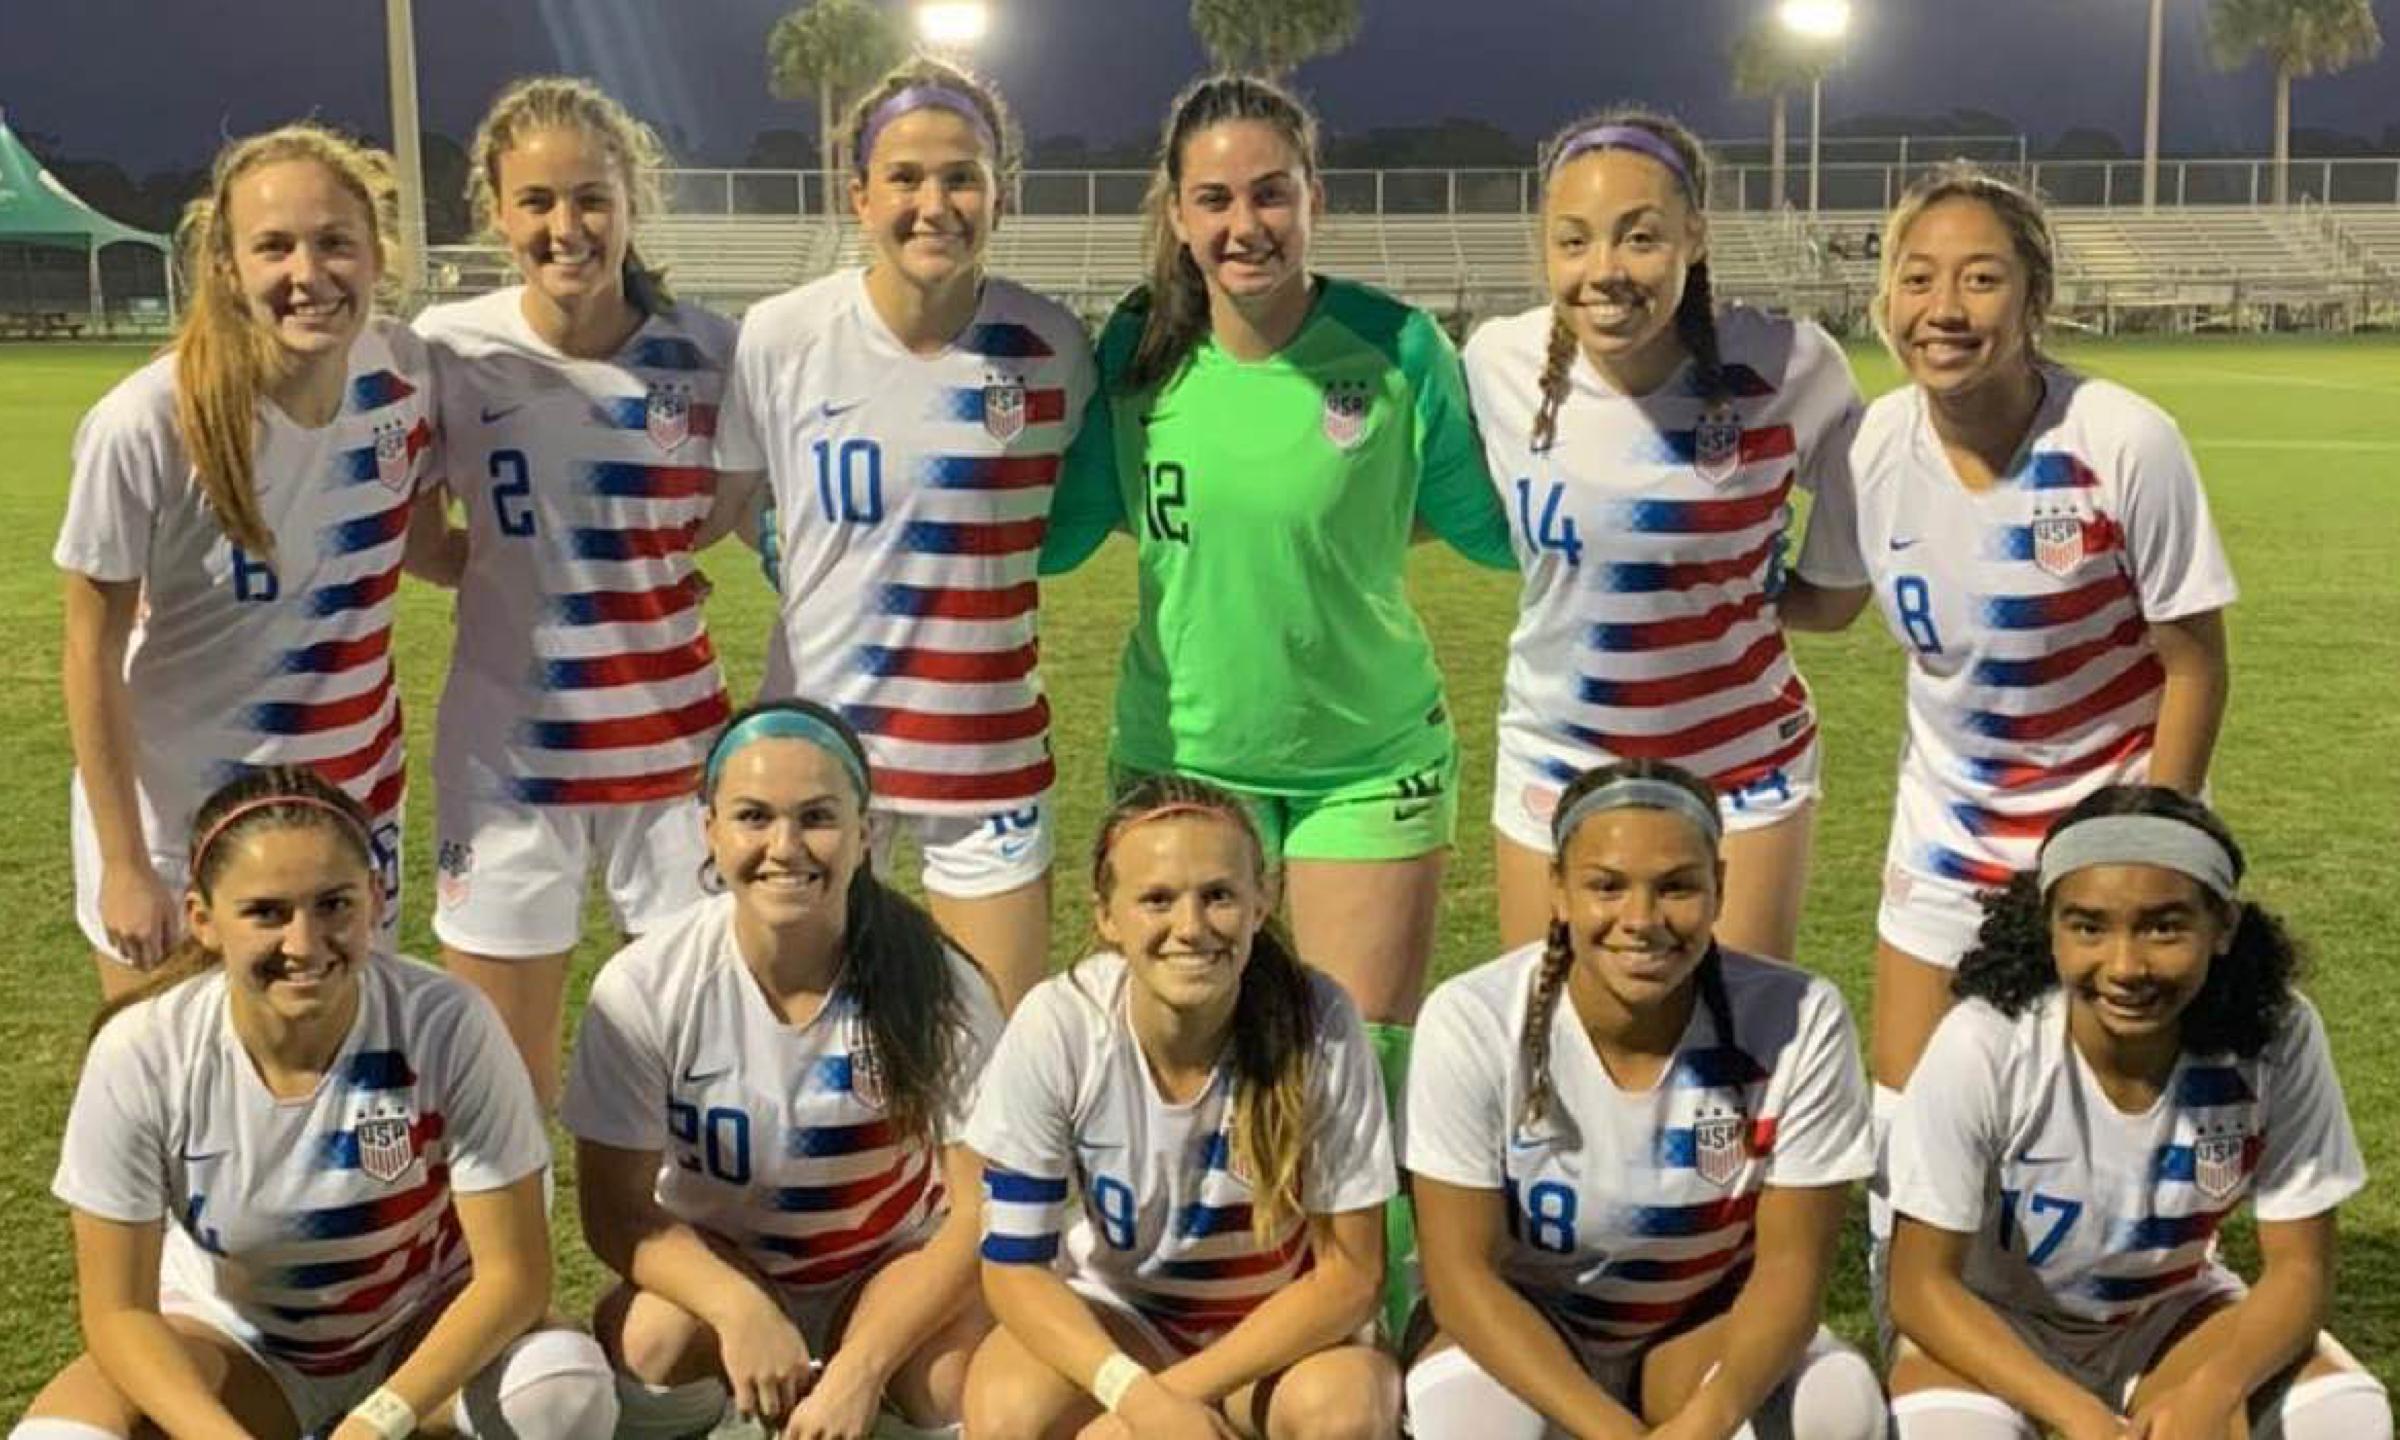 U-18 WOMEN'S NATIONAL TEAM